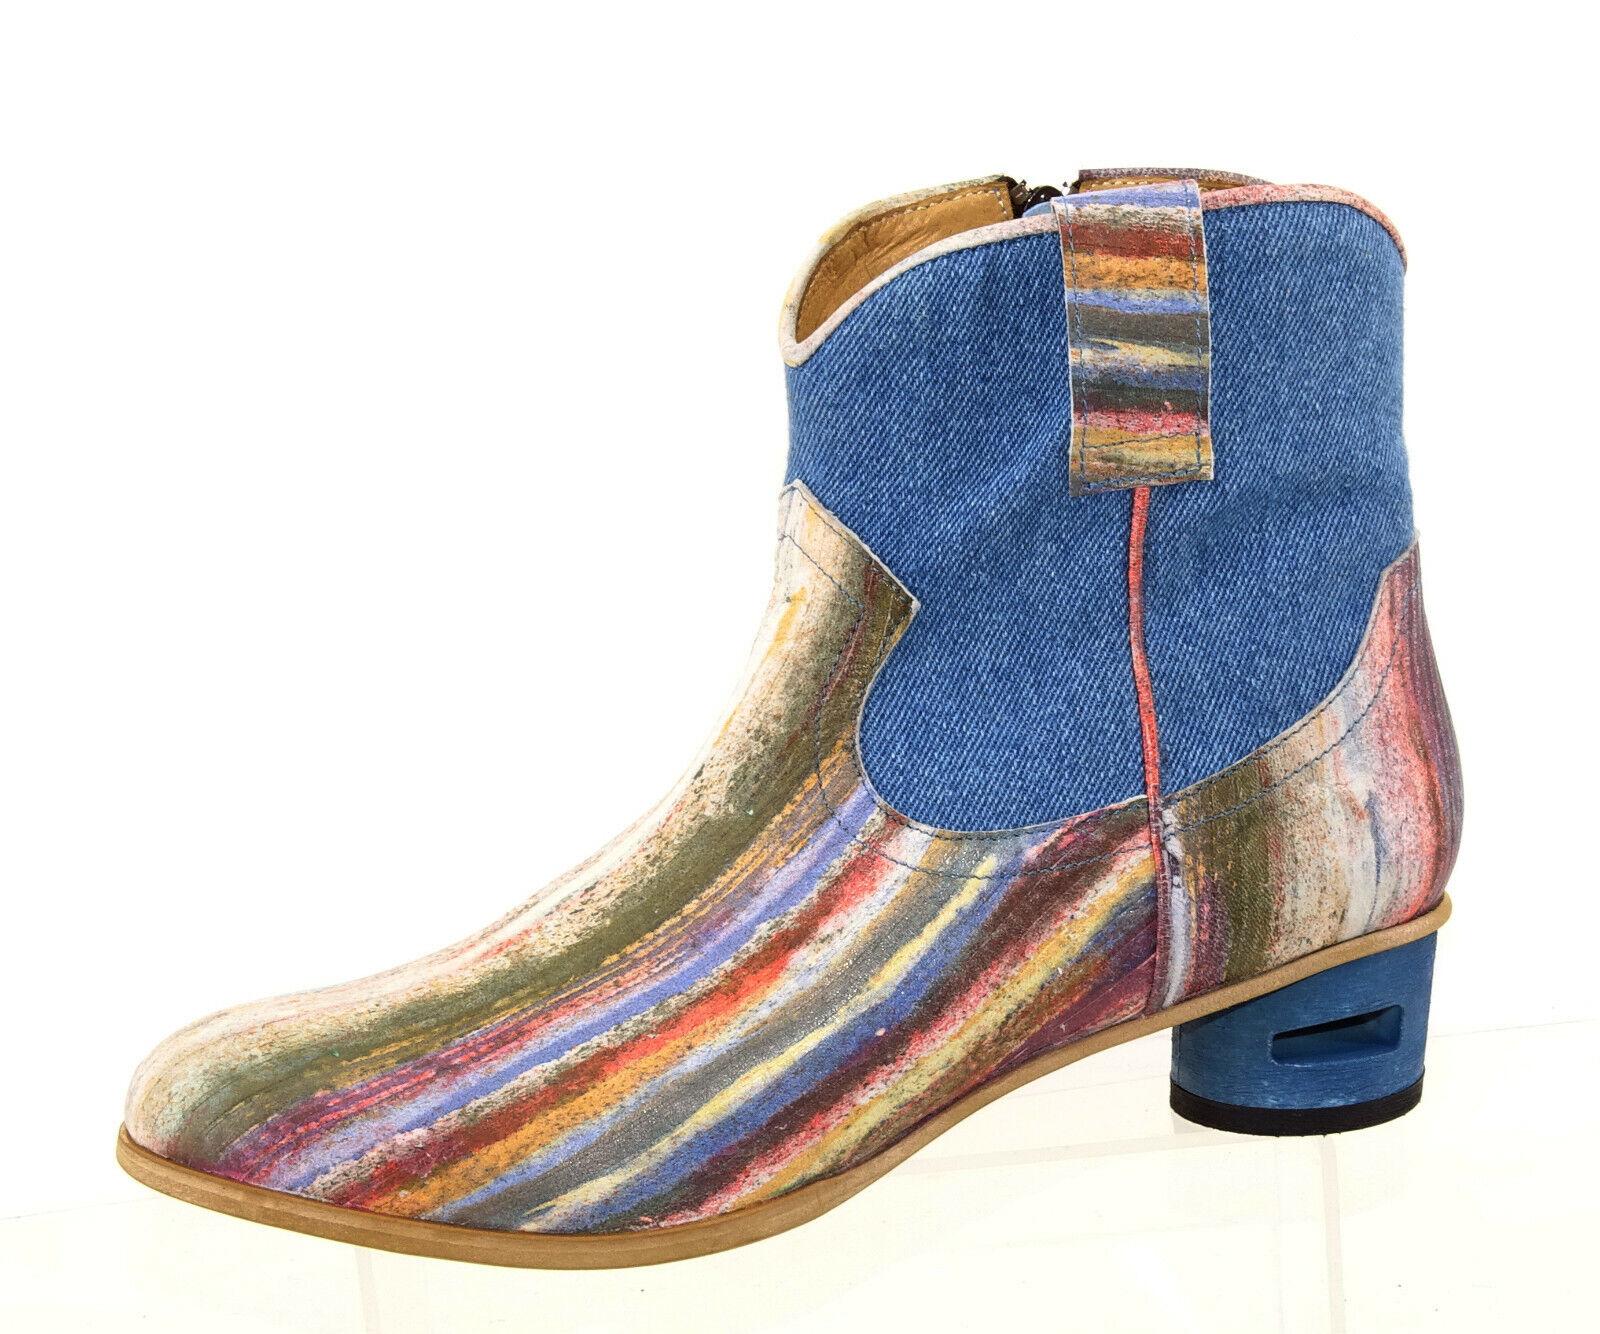 Tiggers Schuhe Winter Stiefel Damenstiefel Stiefeletten Stiefel Leder Gr.40